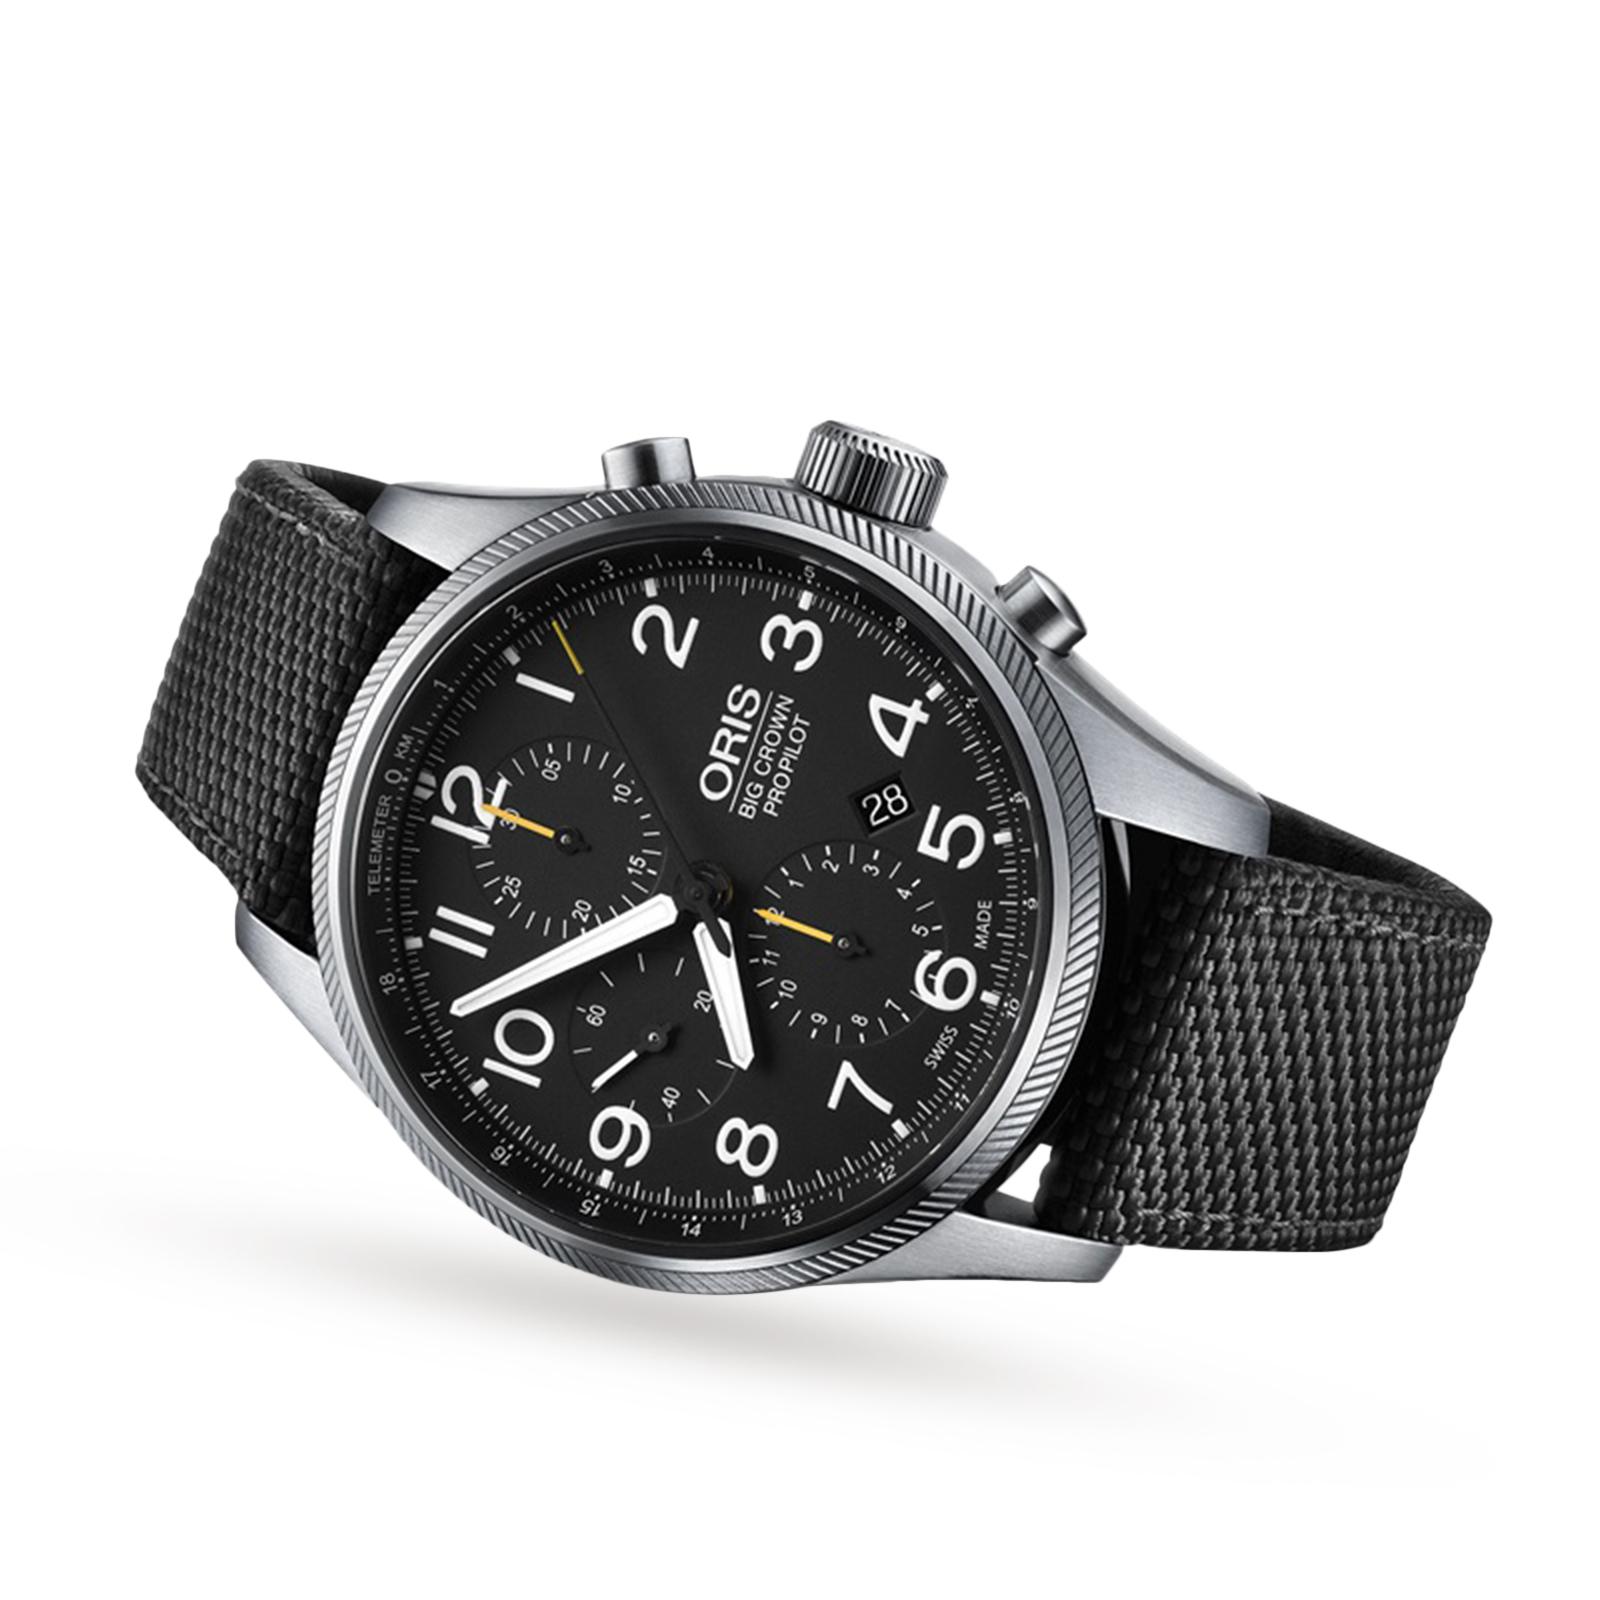 Oris ProPilot Chrono + possible free watch winder - £1350 @ Goldsmiths